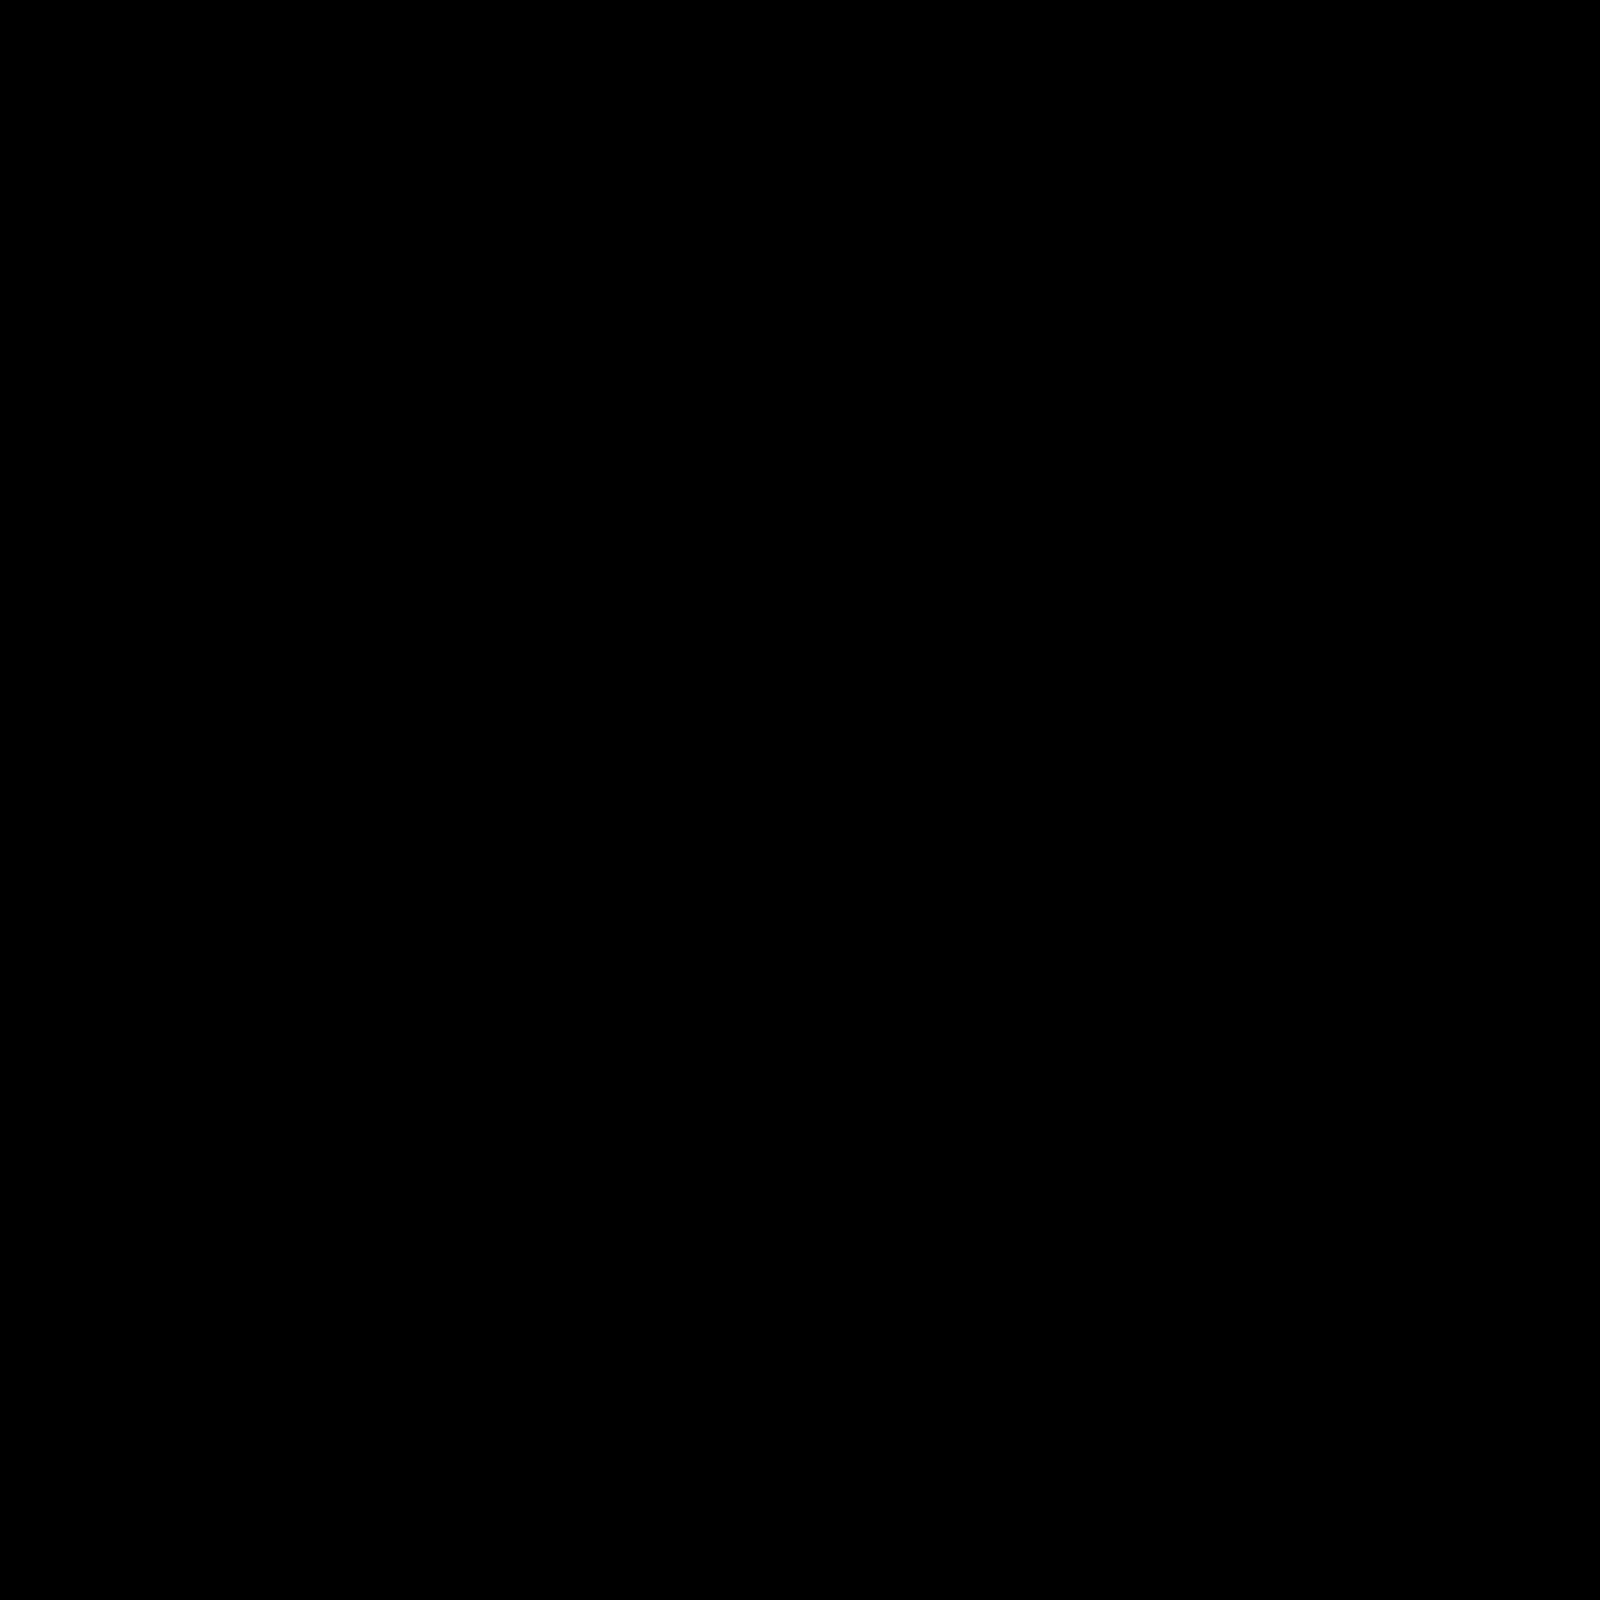 Camera Enhance Filled icon